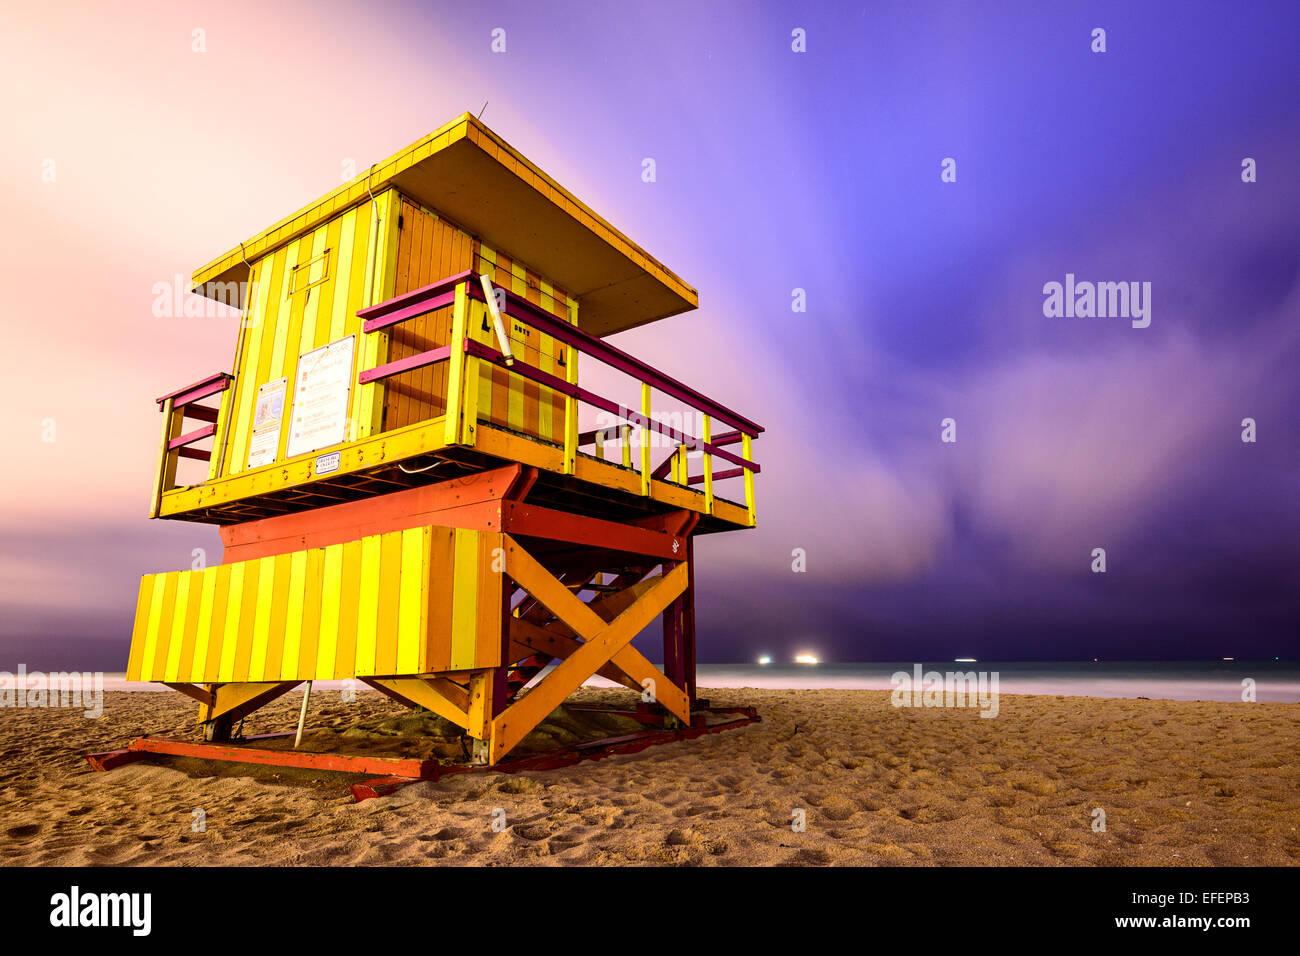 Rettungsschwimmer-Turm in Miami Beach. Stockbild